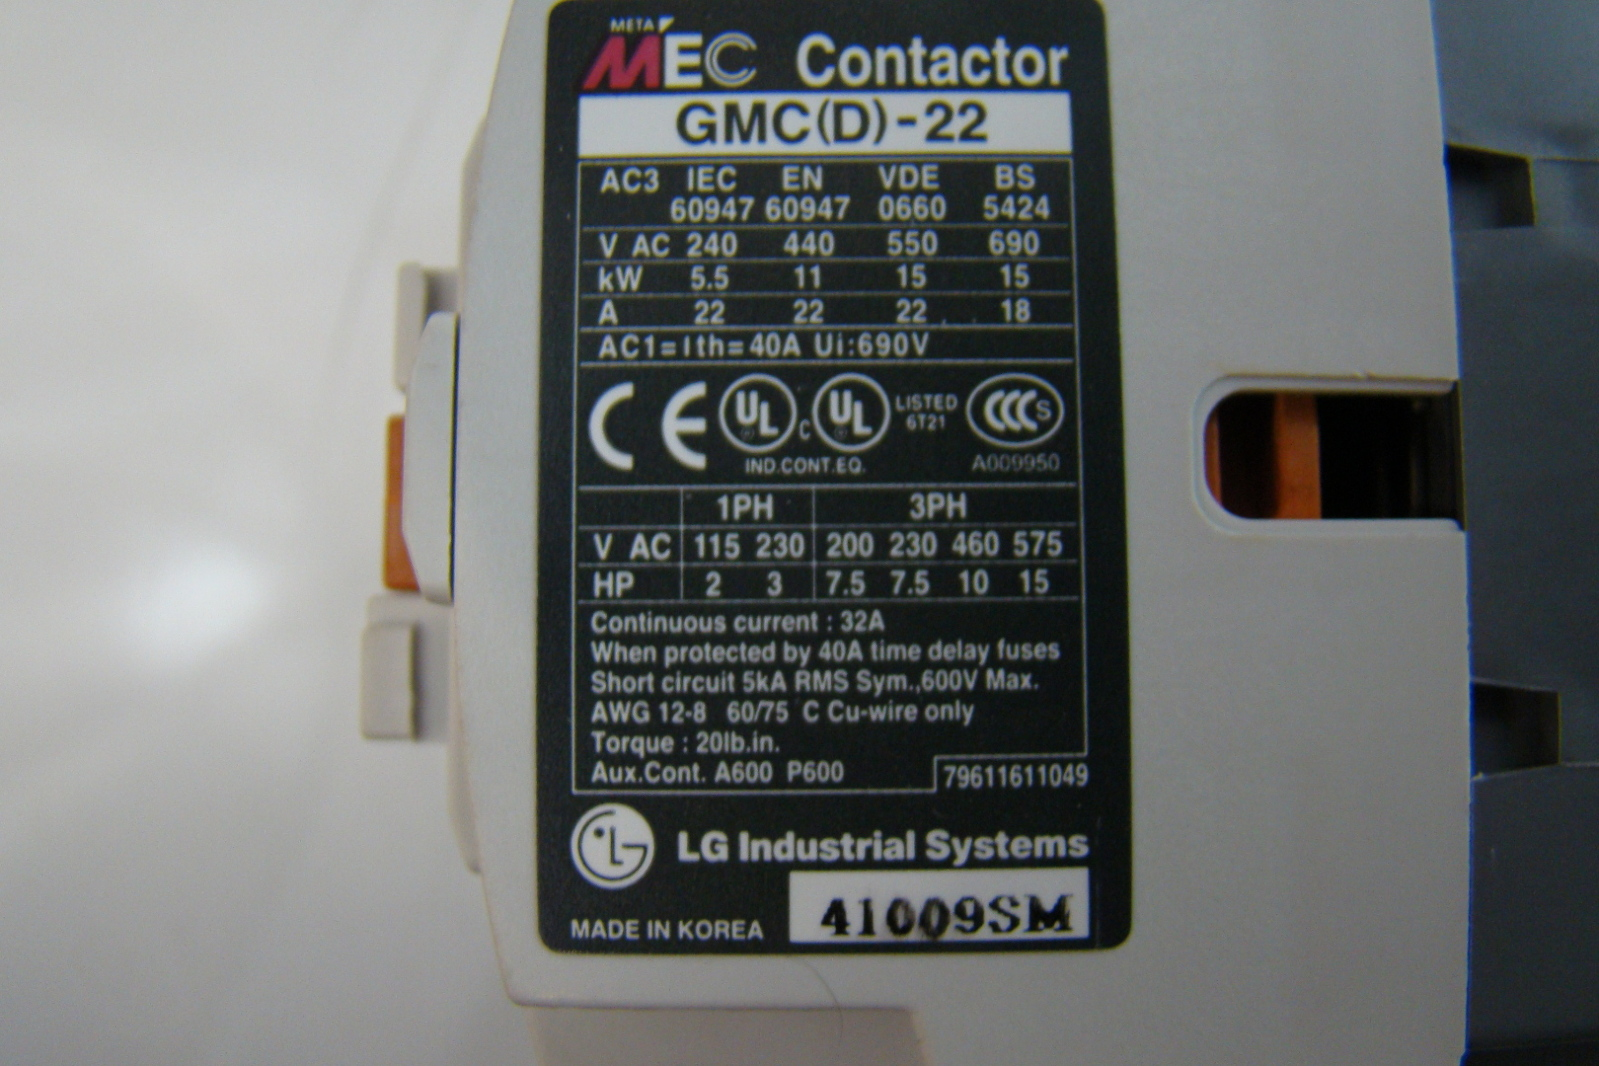 LG Meta Mec 240V Contactor GMD 22R eBay #713526